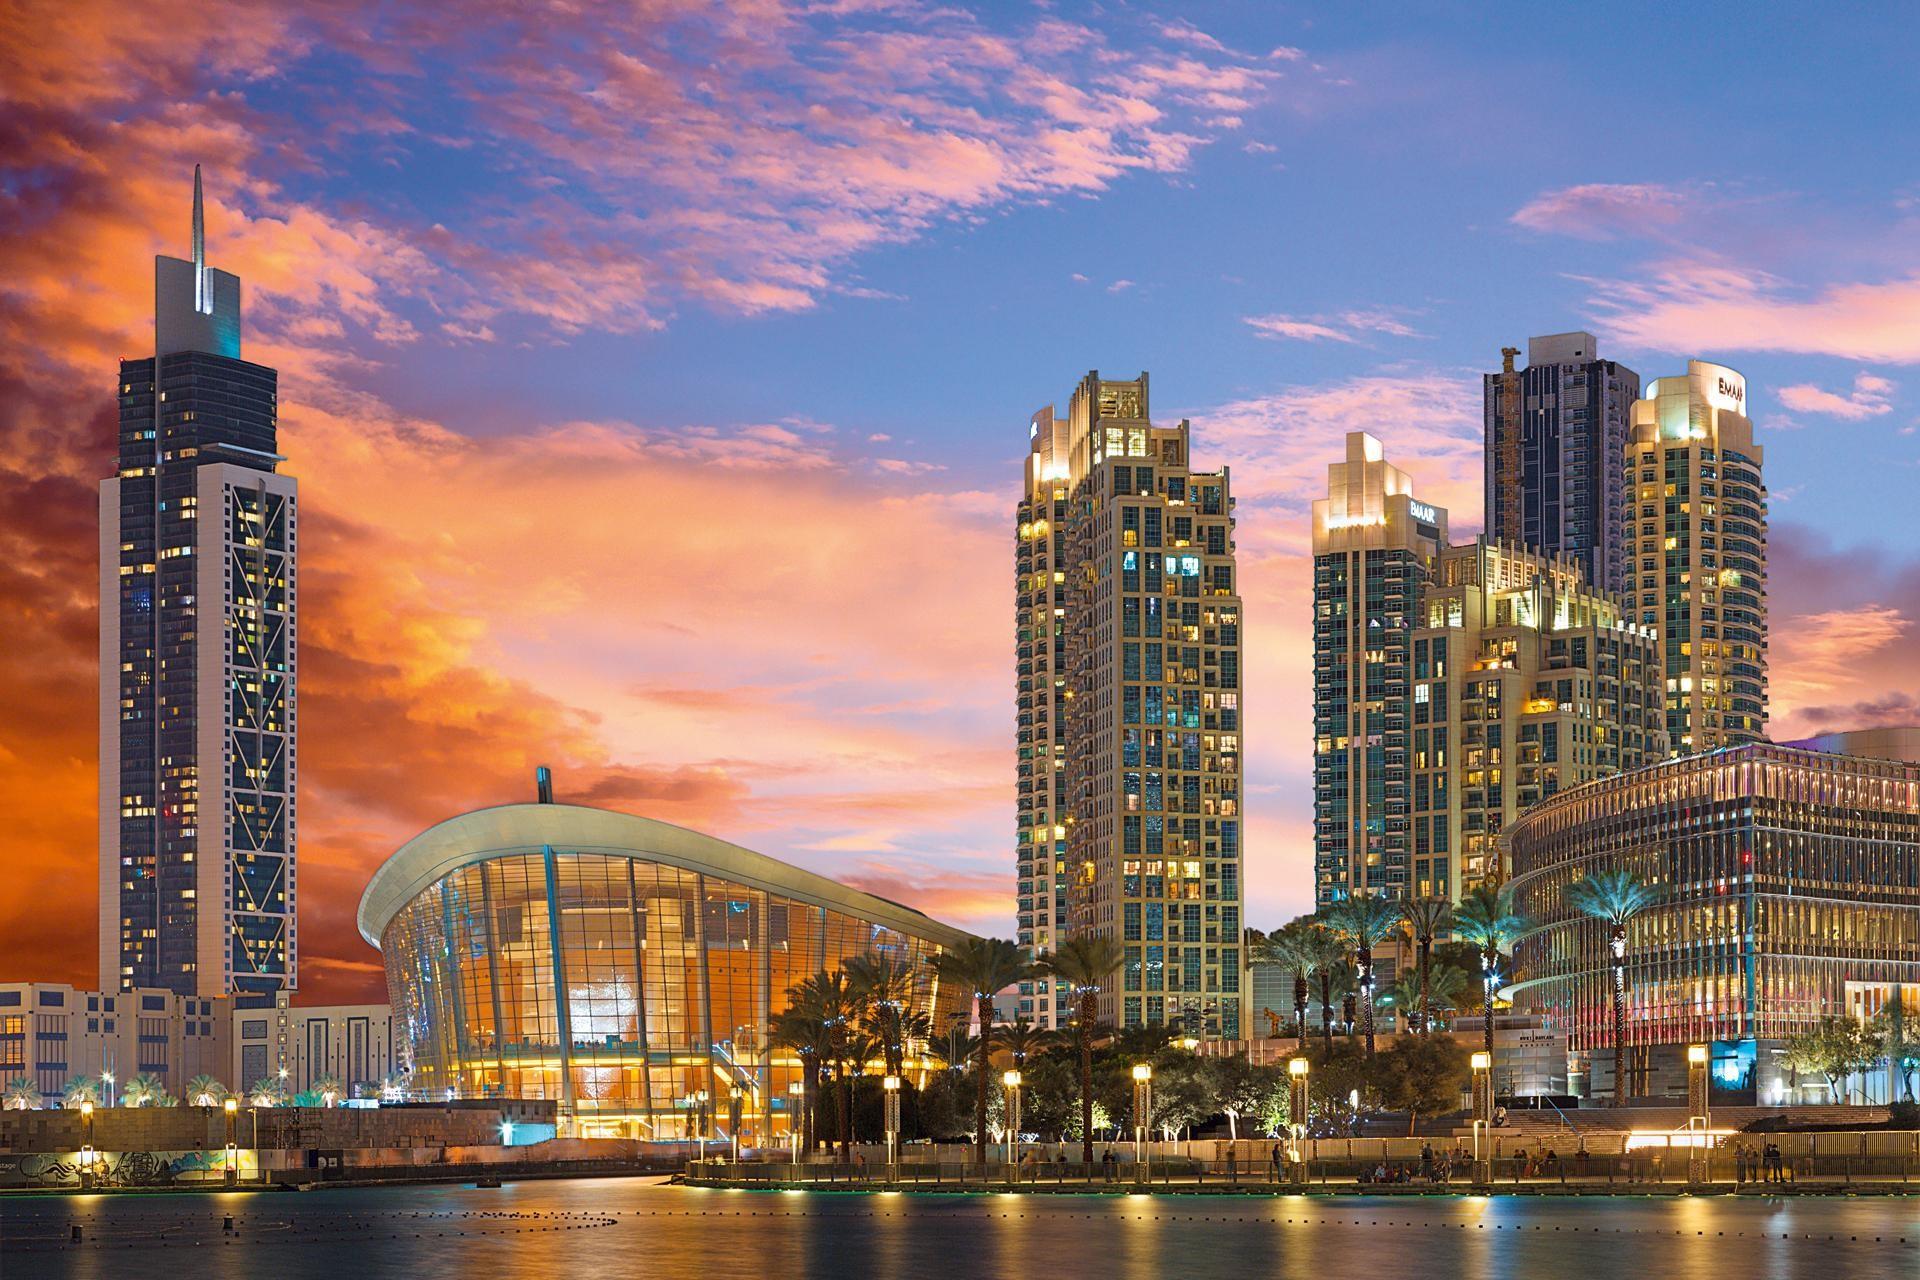 Top 5 Dubai Opera Upcoming Shows in 2021